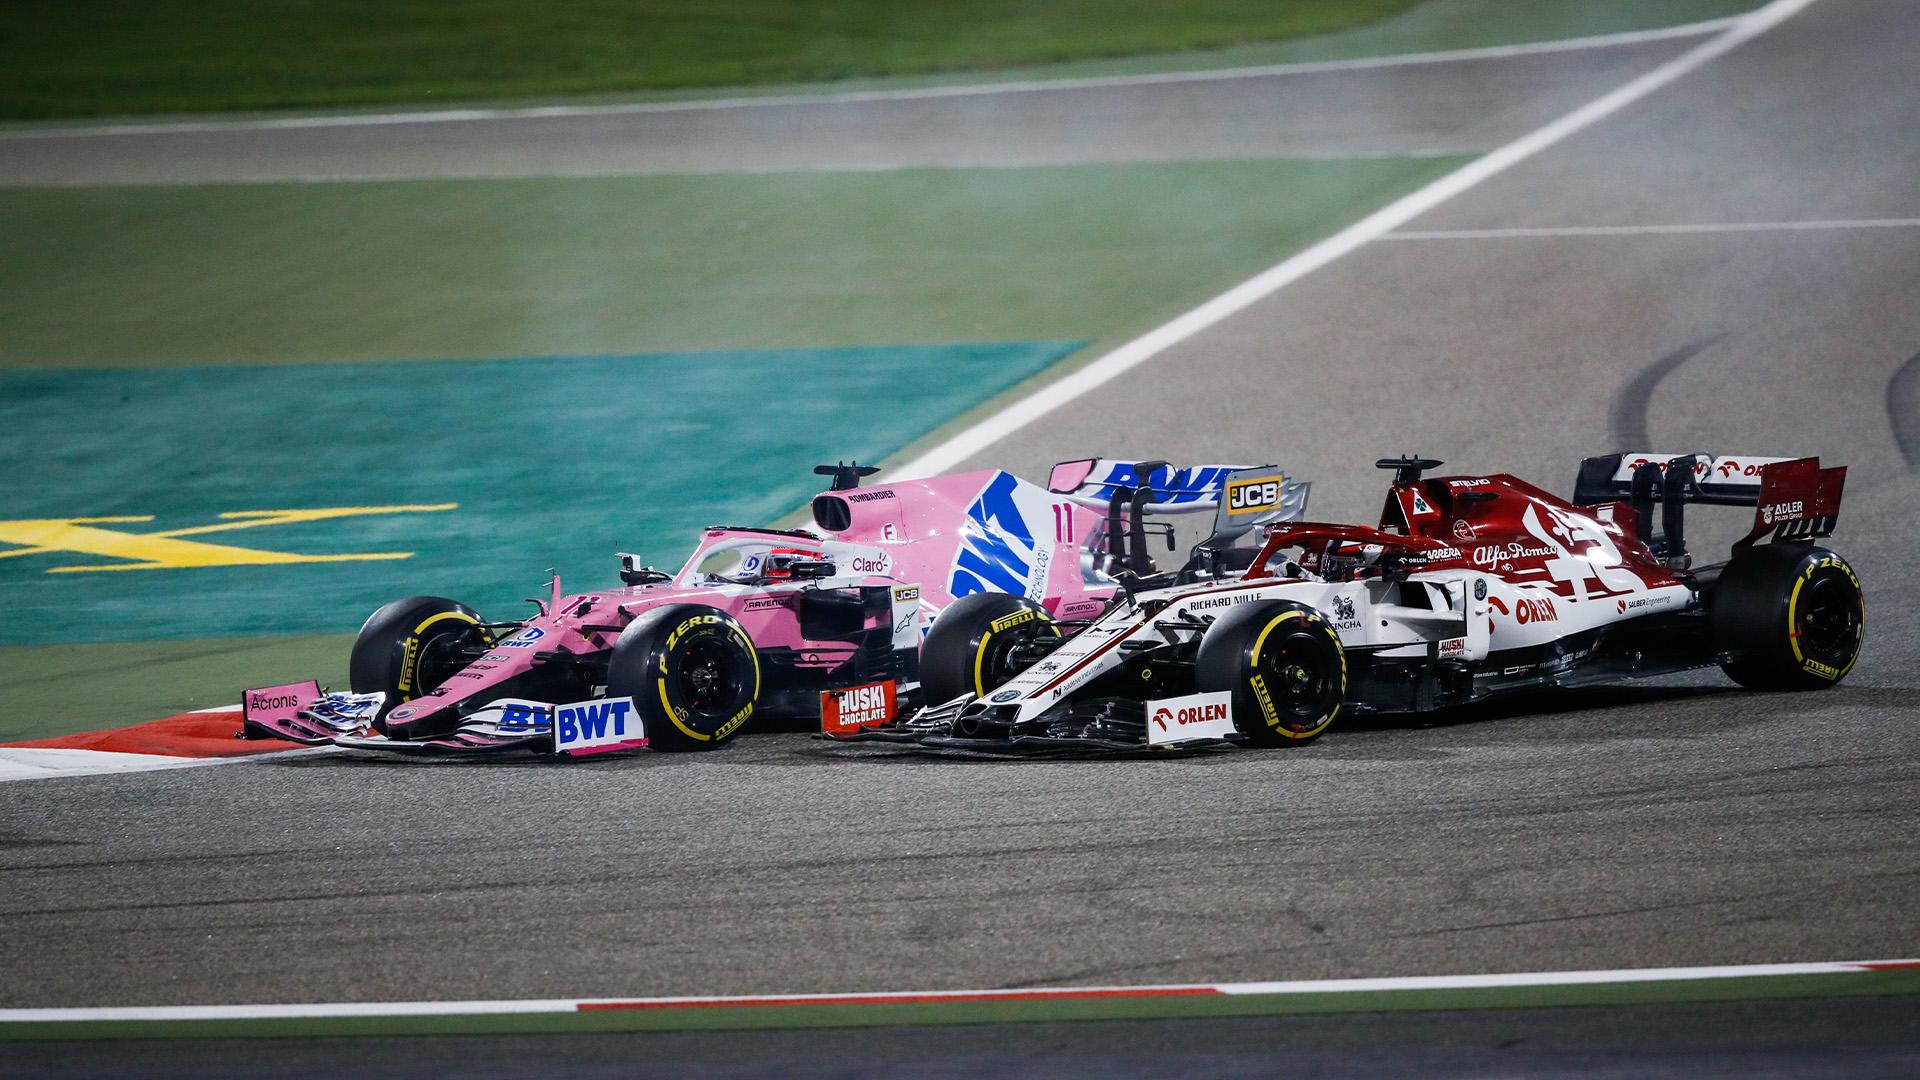 Carlos Sainz overtakes Kimi Taikkonen in the 2020 Sakhir Grand prix